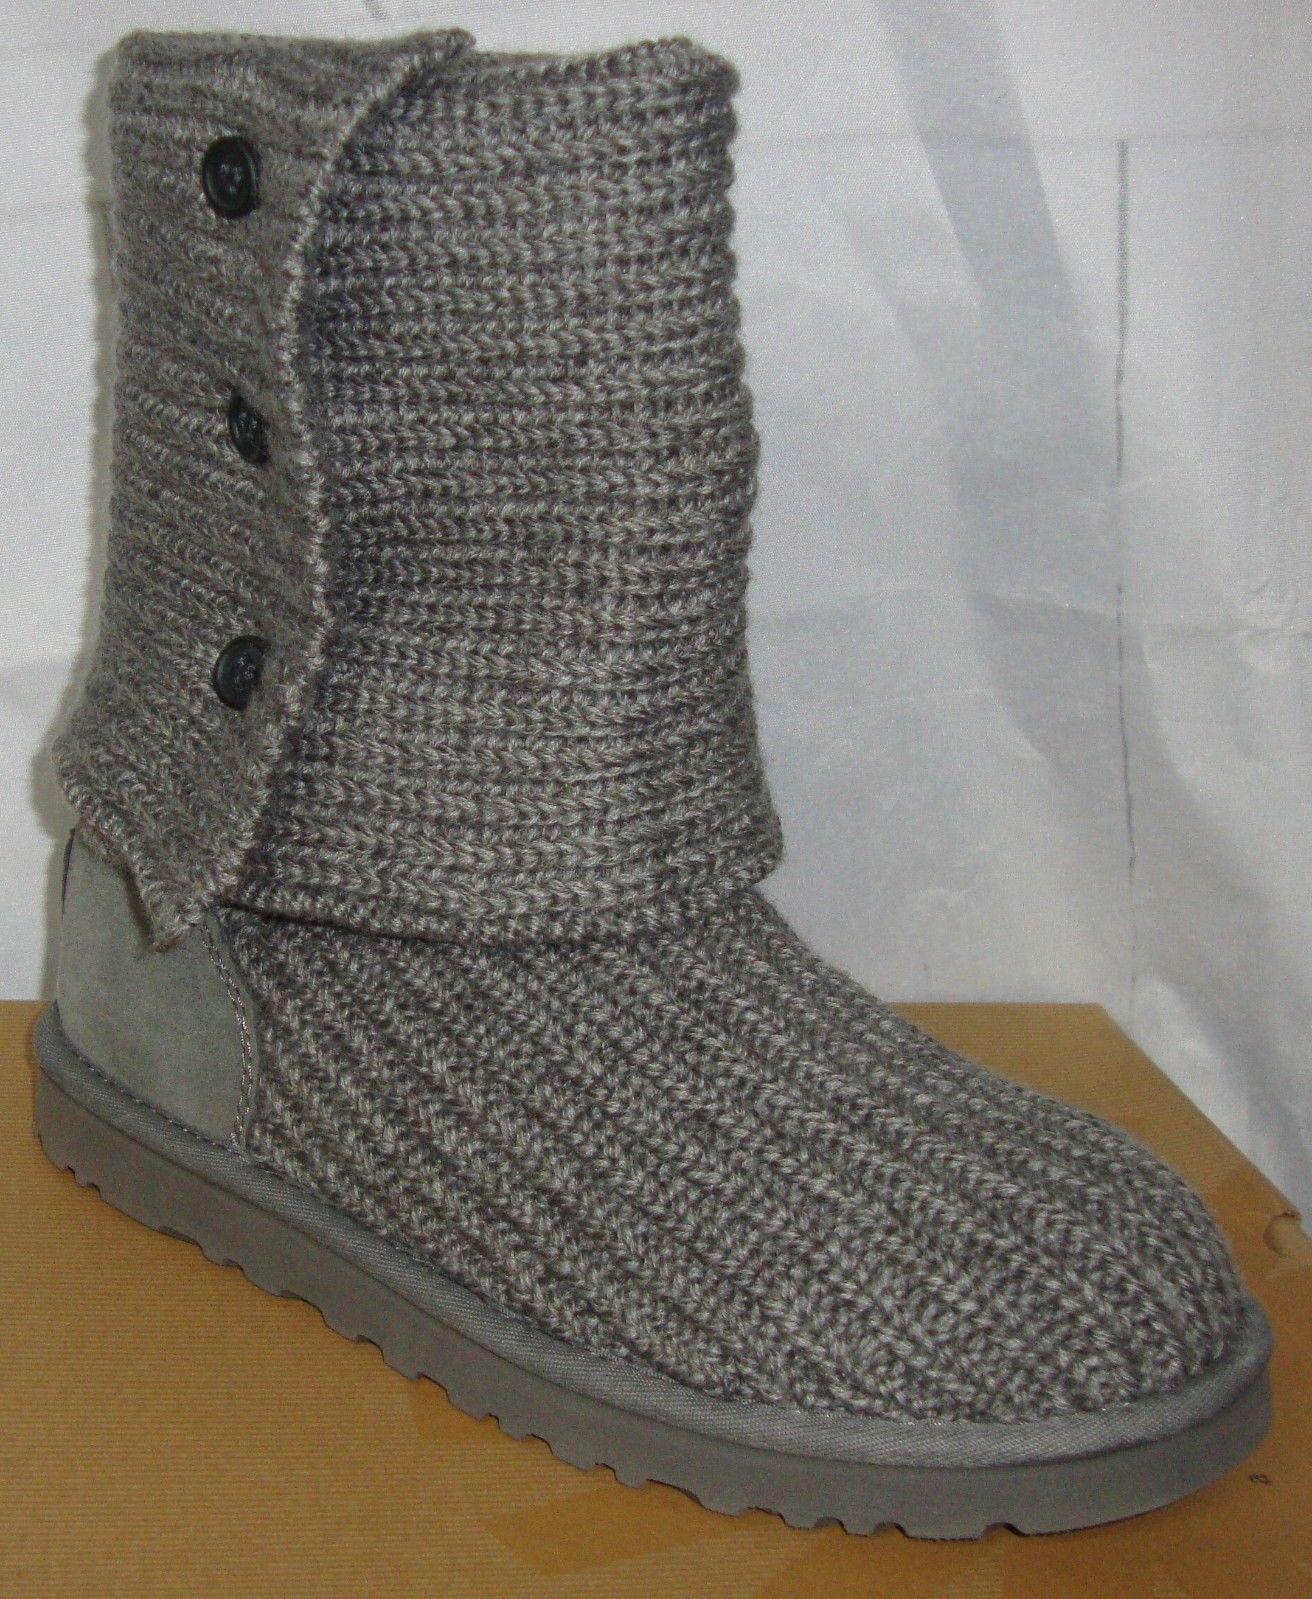 f794e57cd46 UGG Australia Grey Gray Classic Cardy Knit and similar items